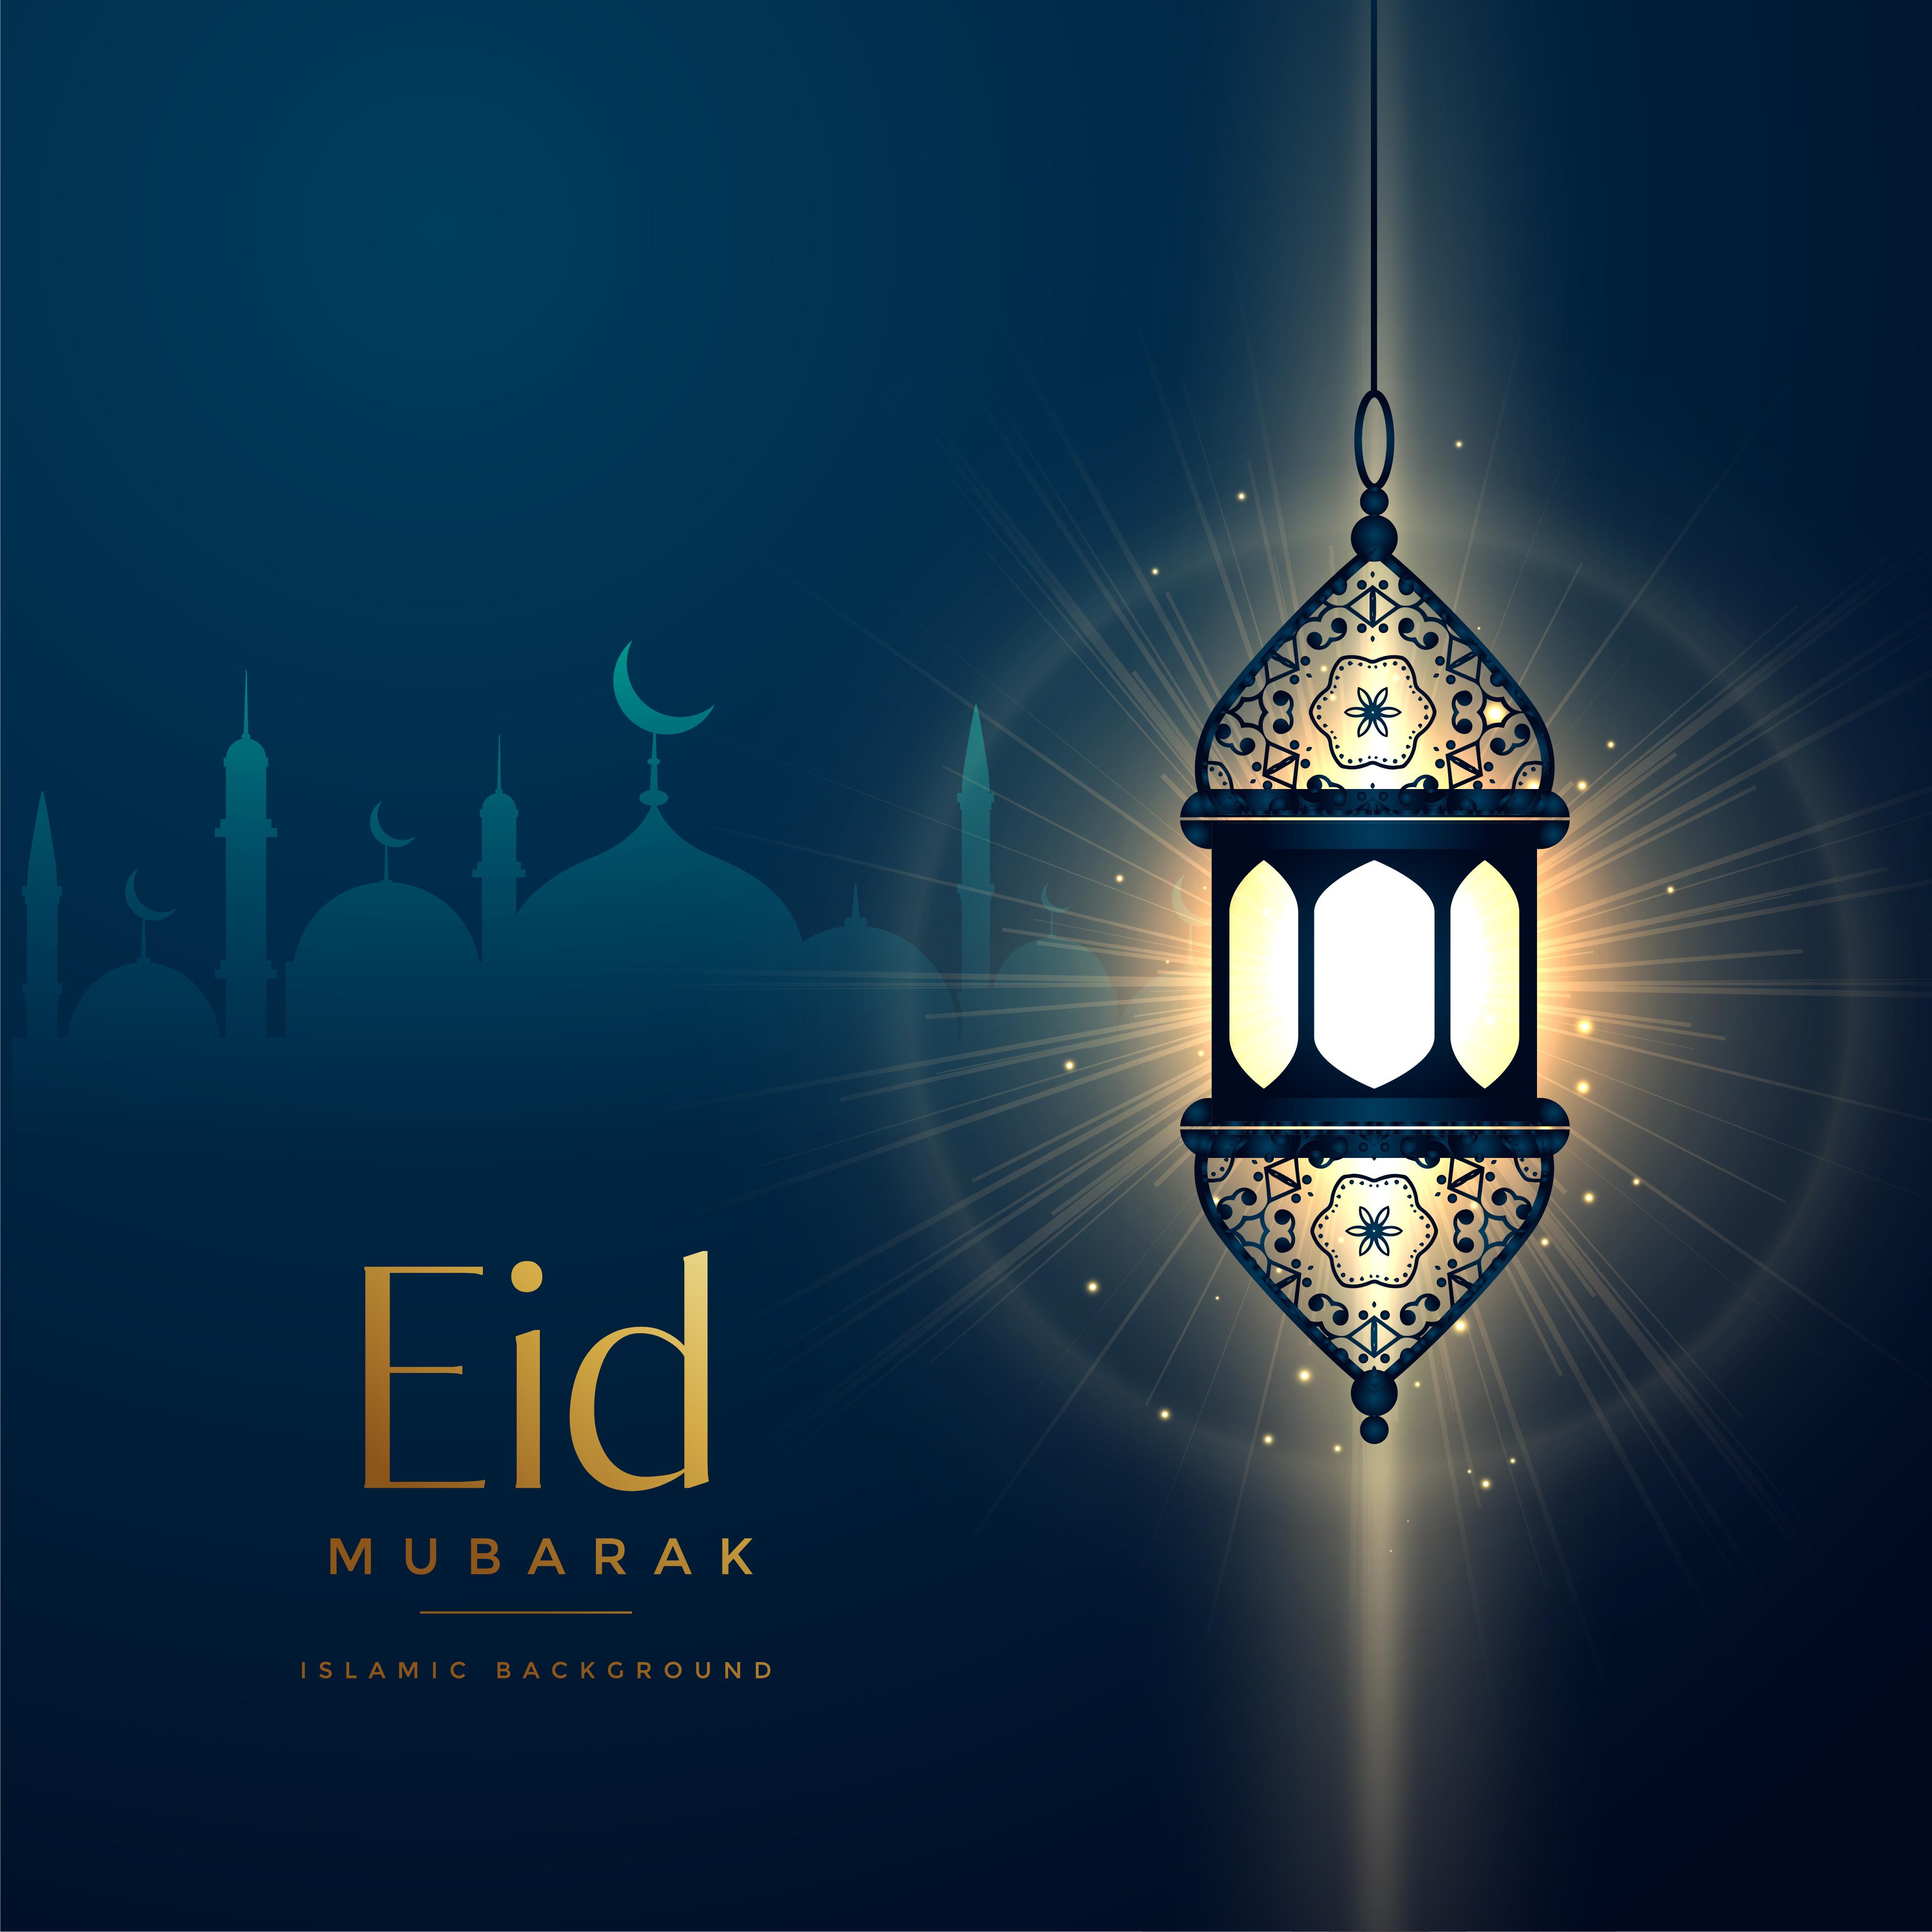 Glowing Lantern Design For Eid Festival Download Free